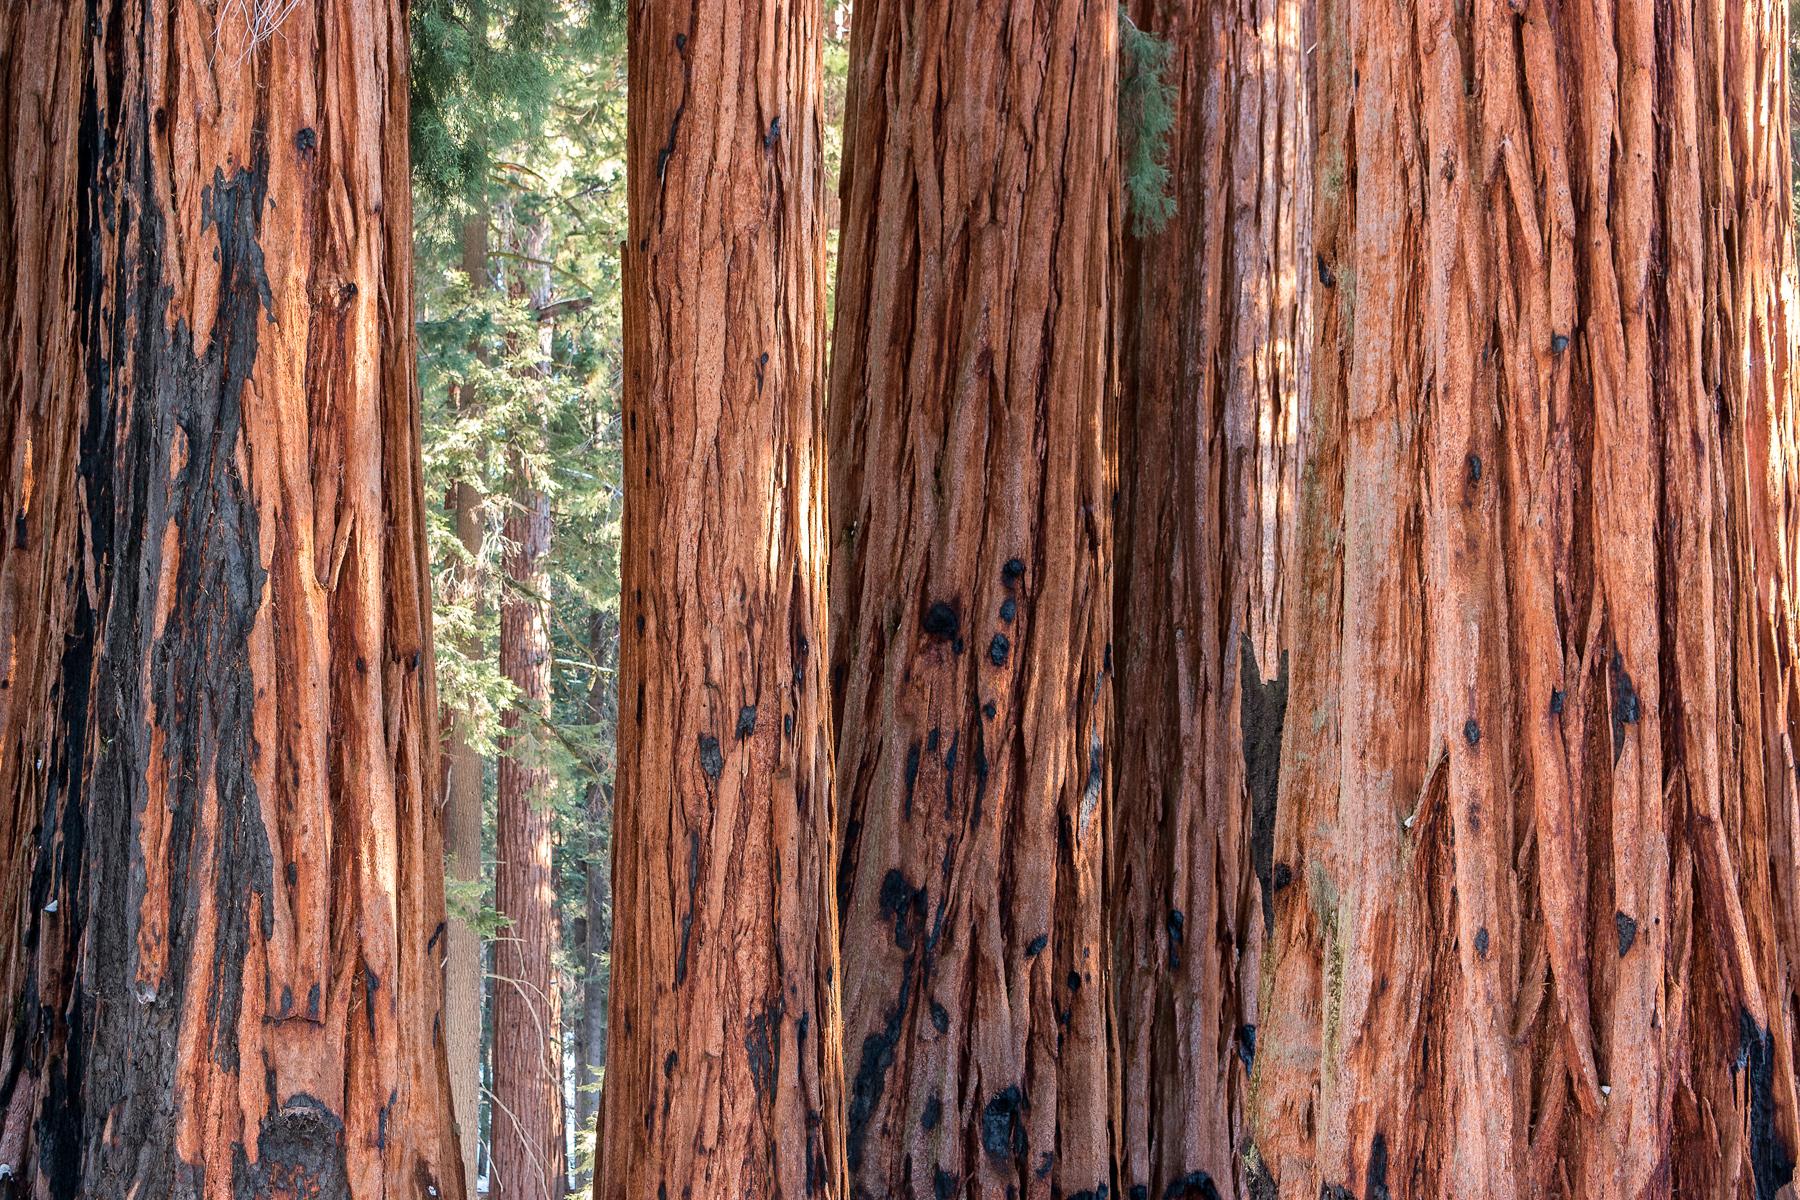 Wasim Muklashy Photography_Sequoia National Park_California_December 2015_-SAM_4019-Edit.jpg